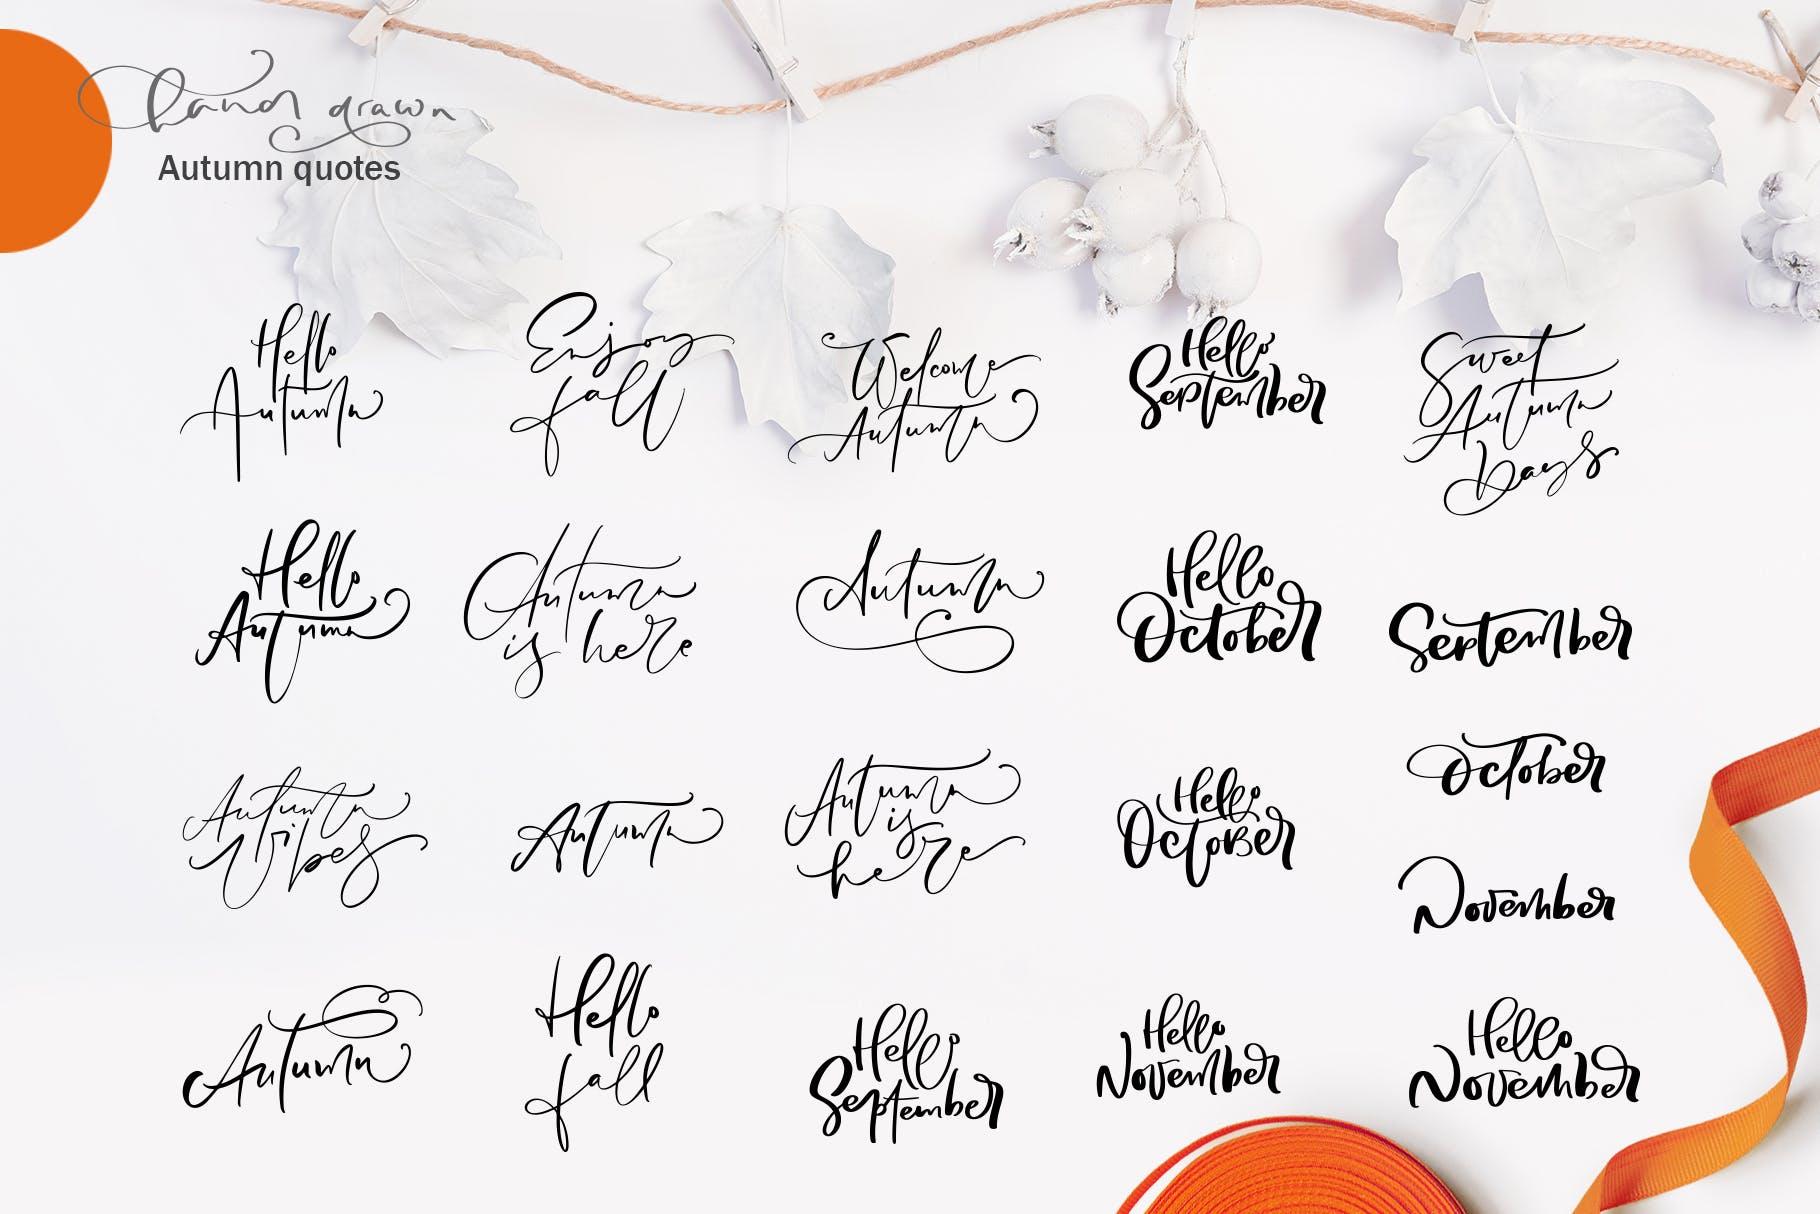 矢量书法和花卉元素图案花纹素材Autumn vector calligraphy floral elements插图(2)